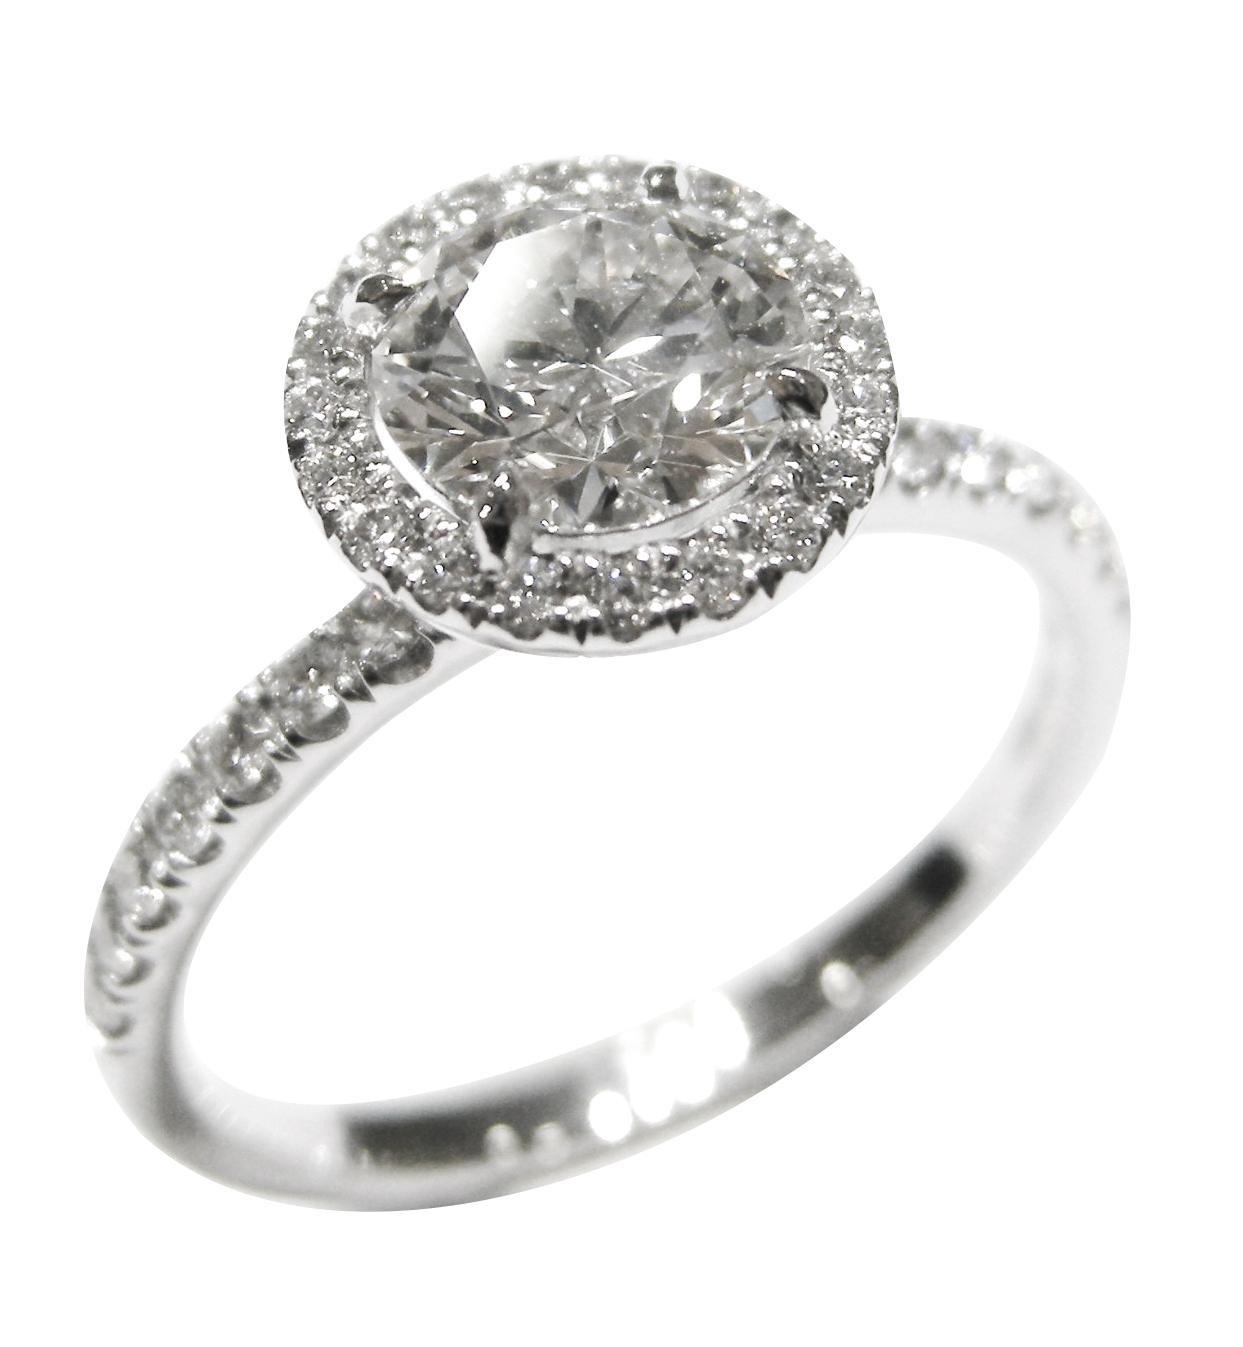 ROUND BRILLIANT DIAMOND RING WITH SINGLE HALO AND PAVE DIAMOND BAND BESPOKE FINE JEWELLERY BY SHAHINA HATTA